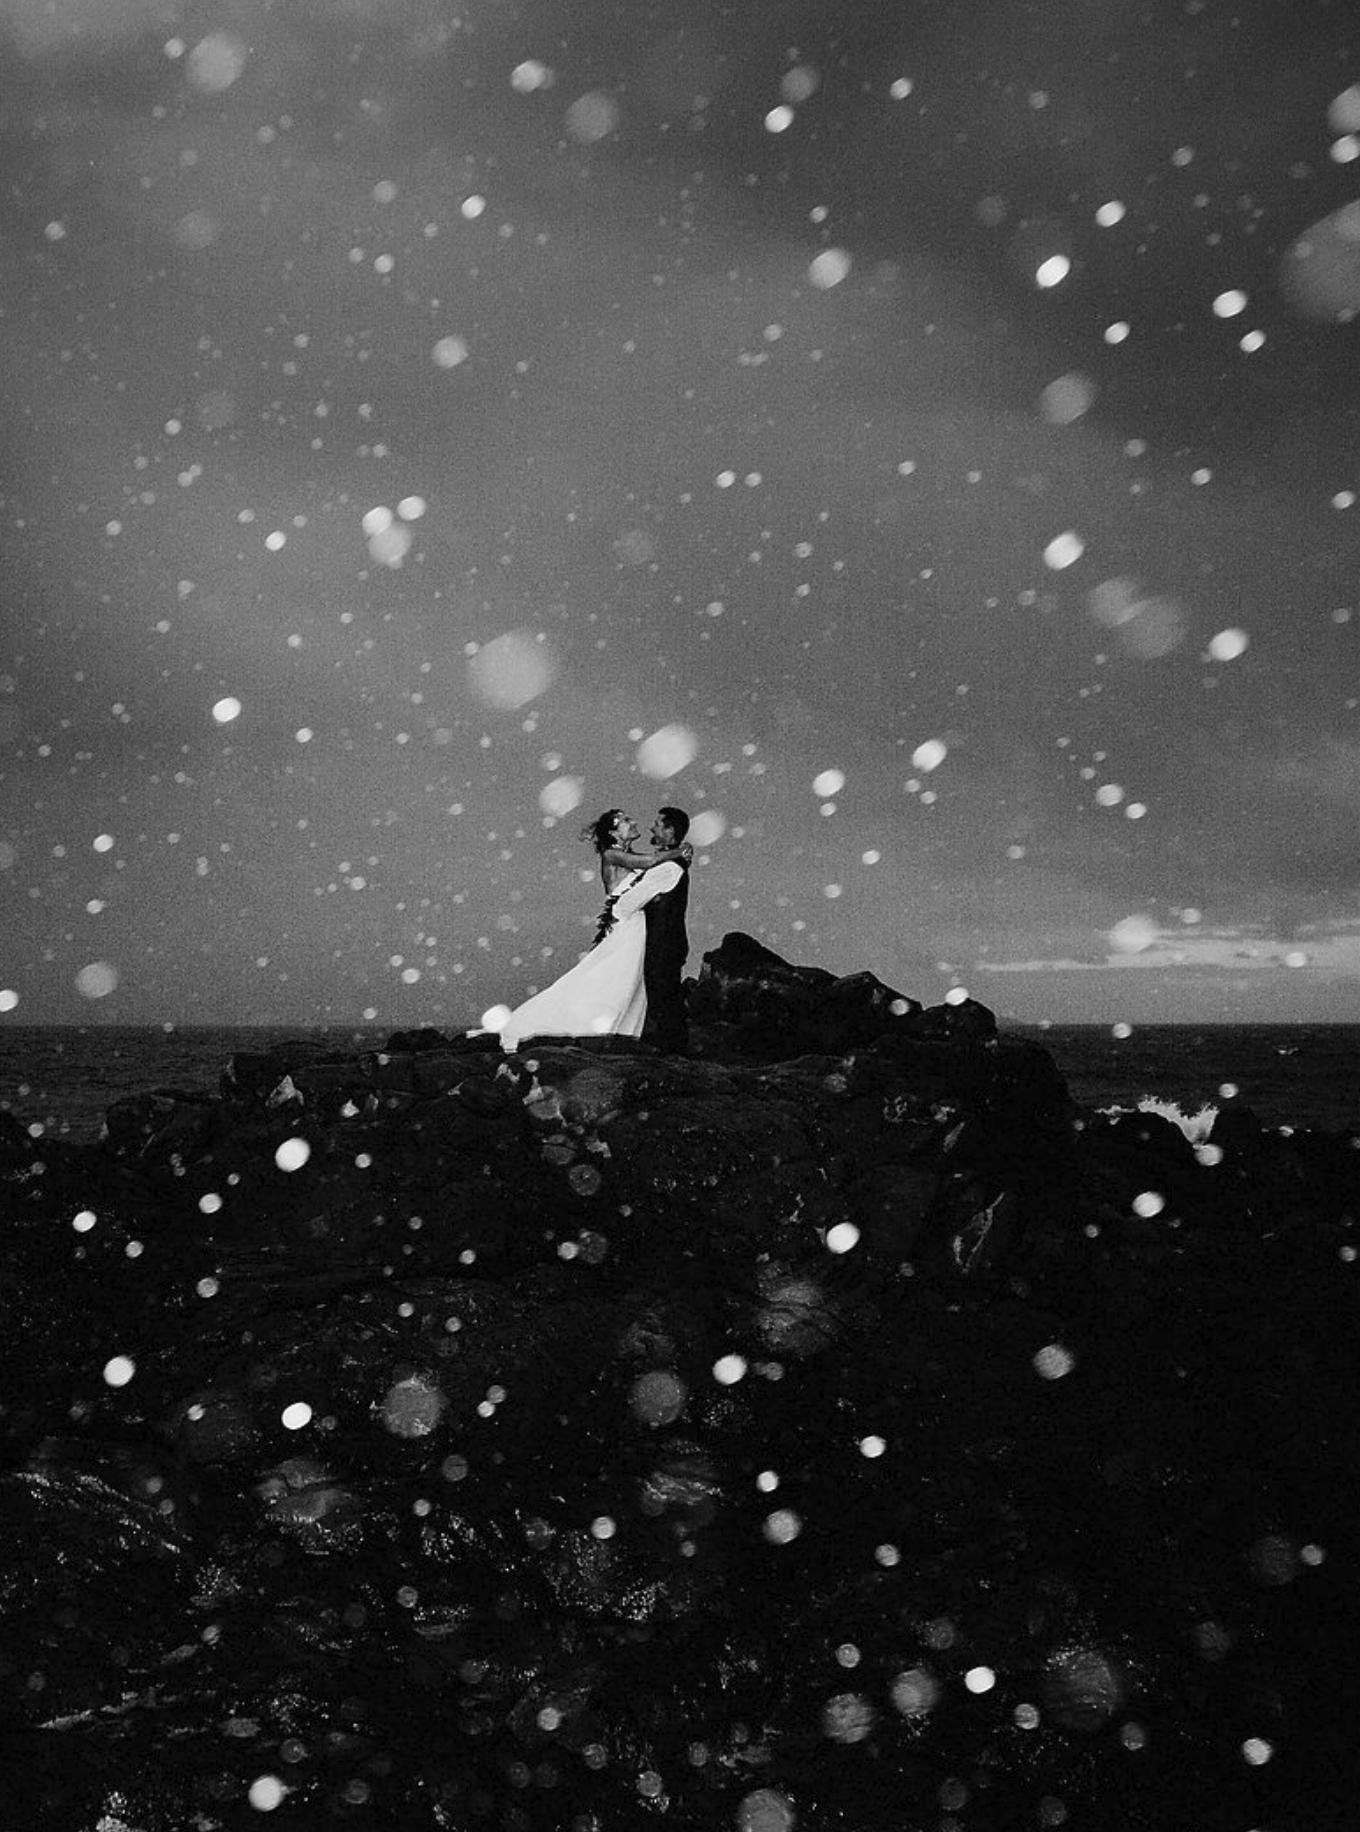 chris-j-evans-rain-wedding00003.png